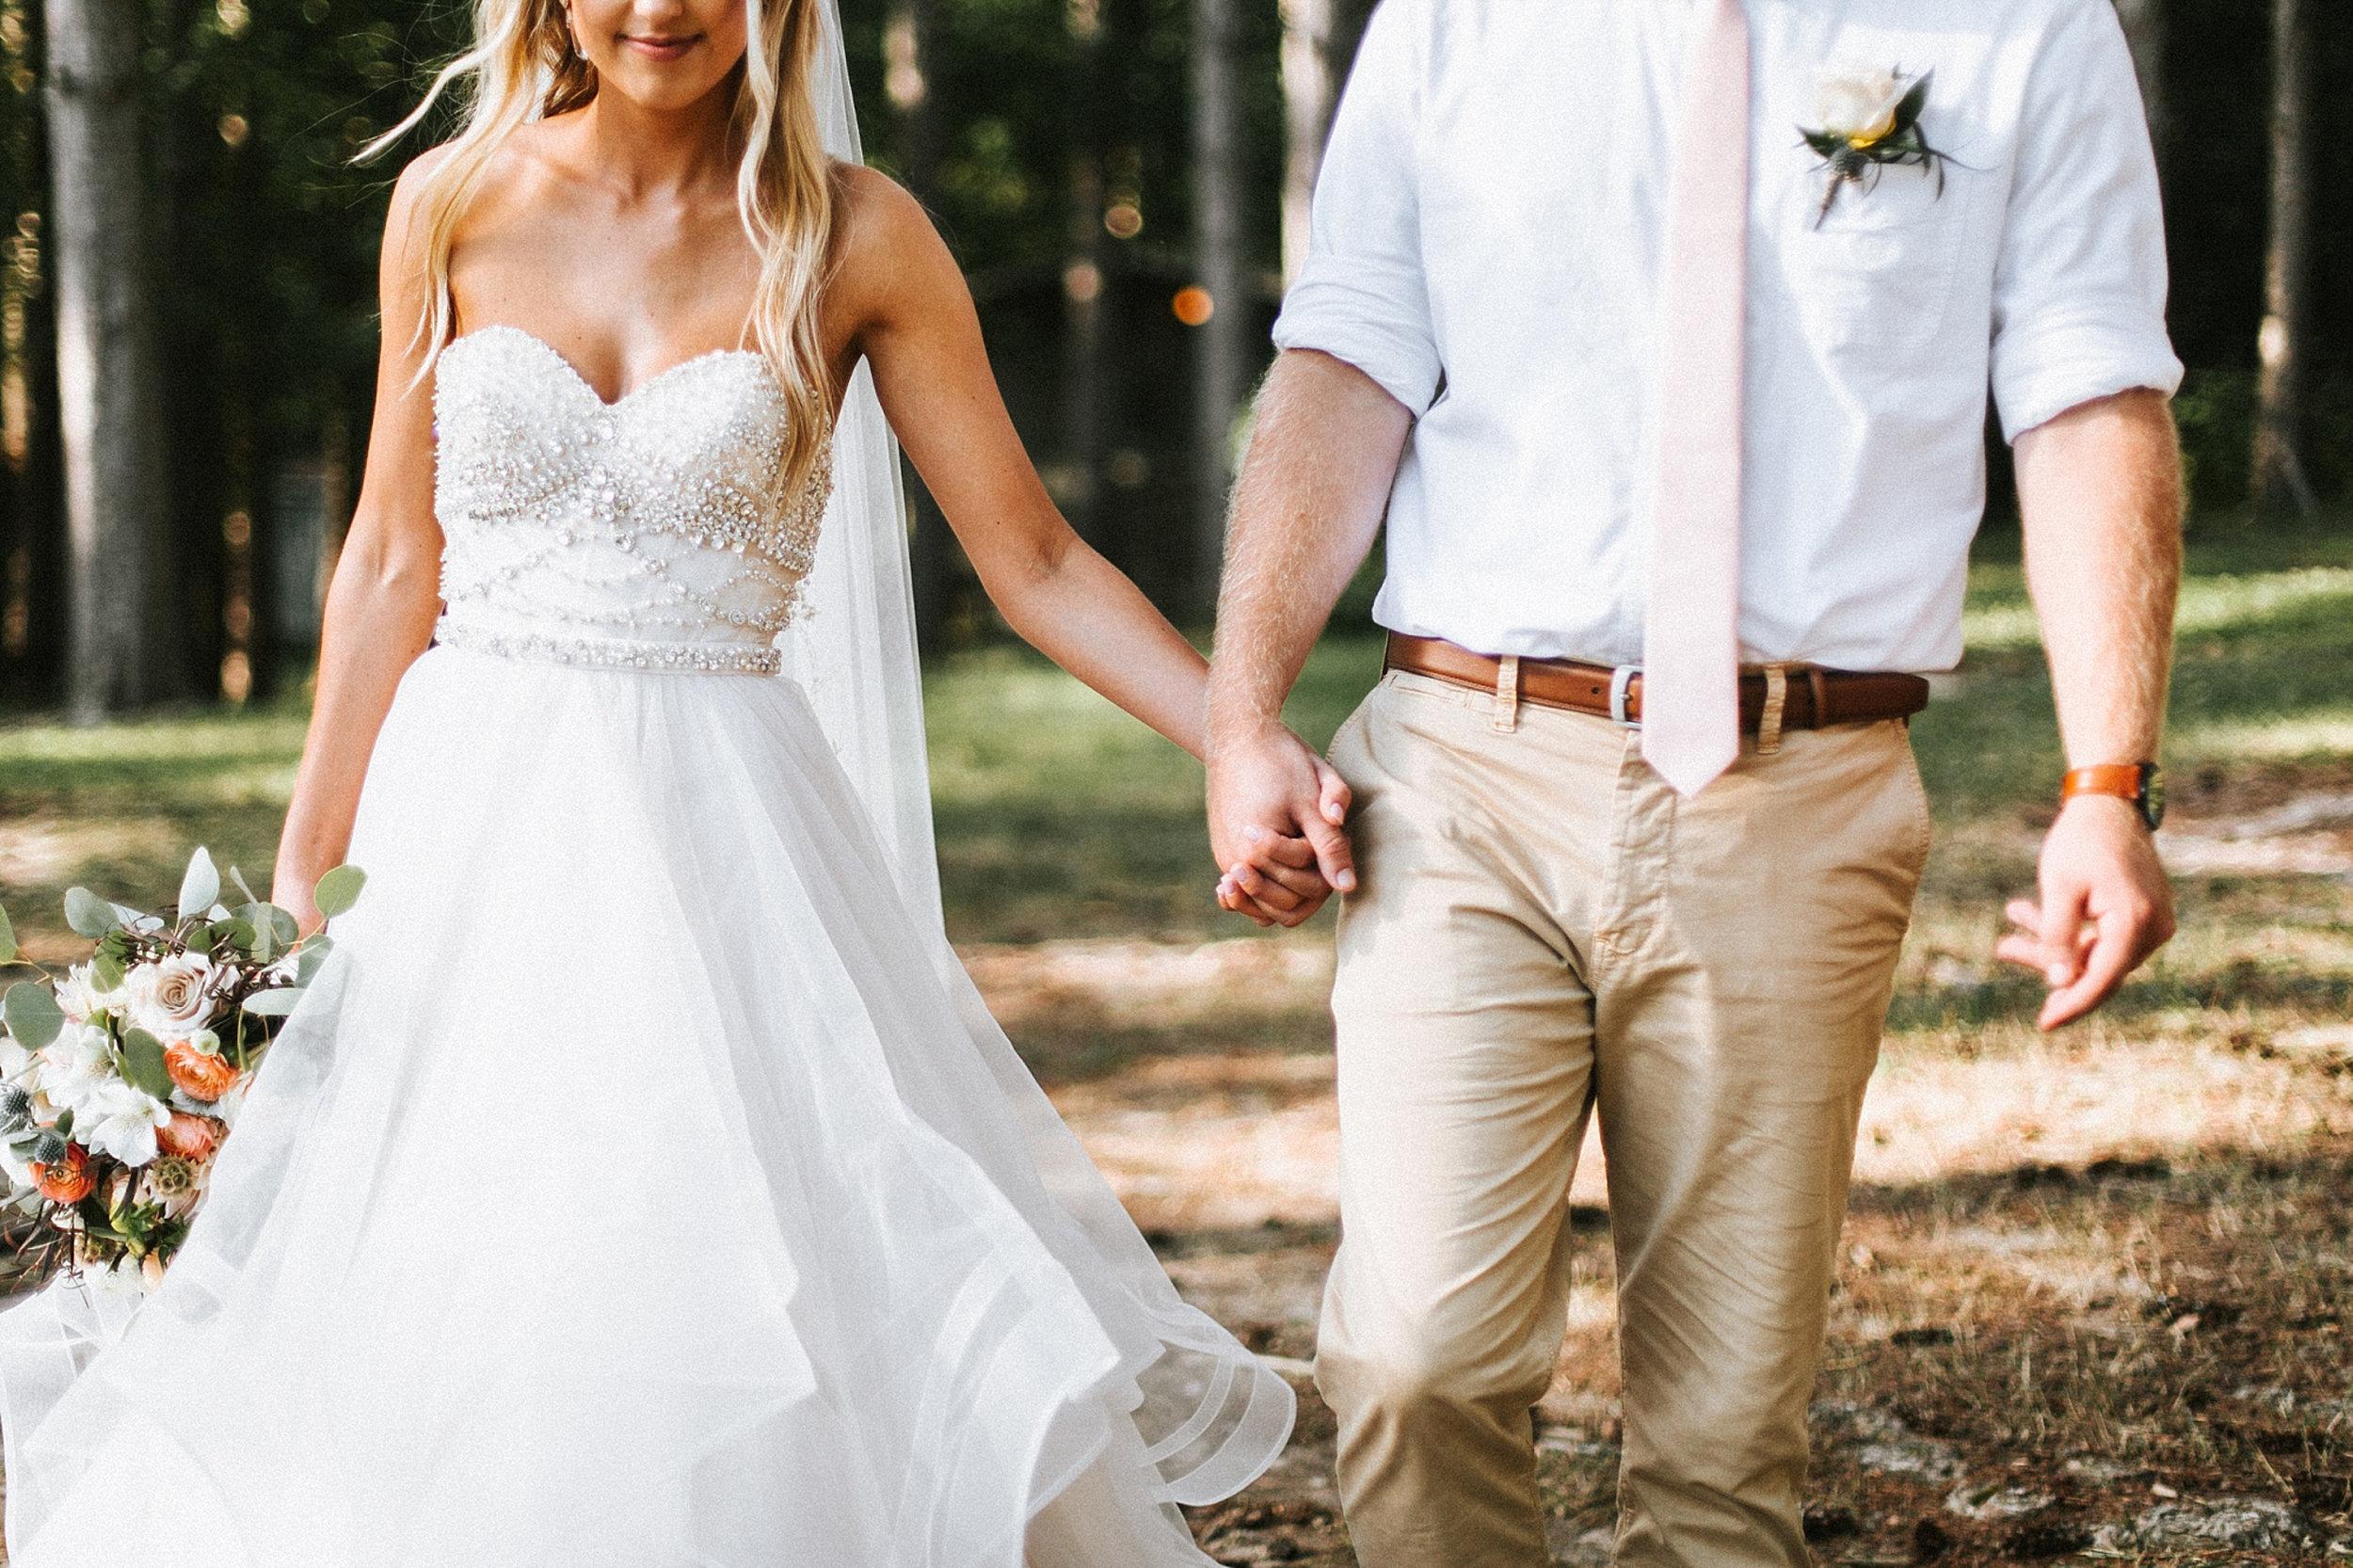 Brooke Townsend Photography - Cincinnati Wedding Photographer (109 of 153).jpg